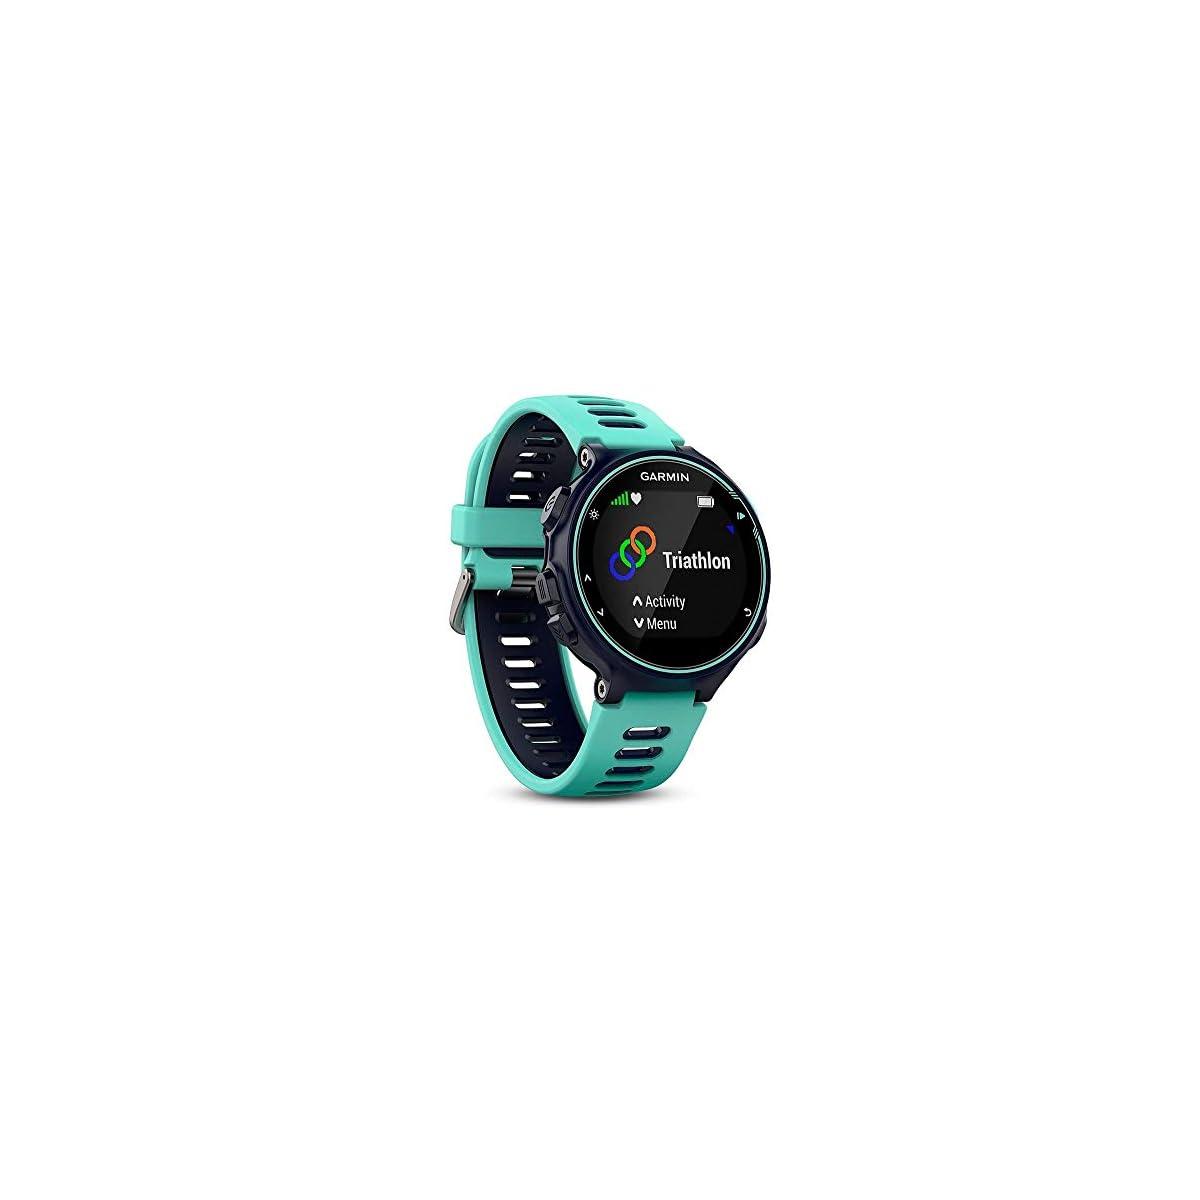 41qqDvQjBFL. SS1200  - Garmin 735XT Forerunner Reloj multisport con GPS, Unisex adulto